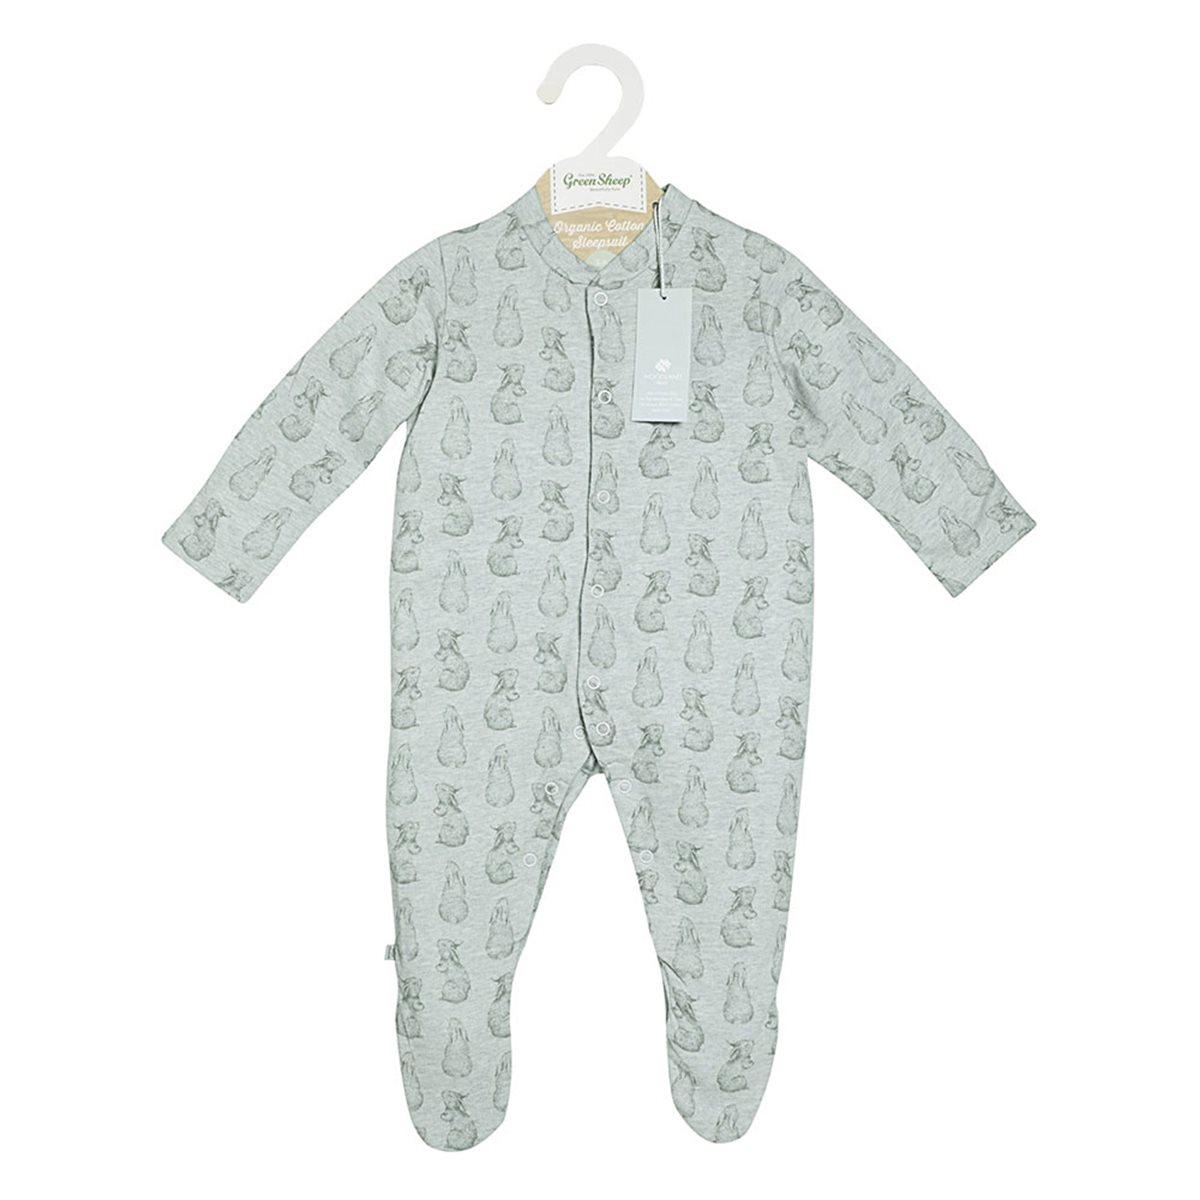 8576dc01536d 100% Organic Baby Sleepsuit with Rabbit Print